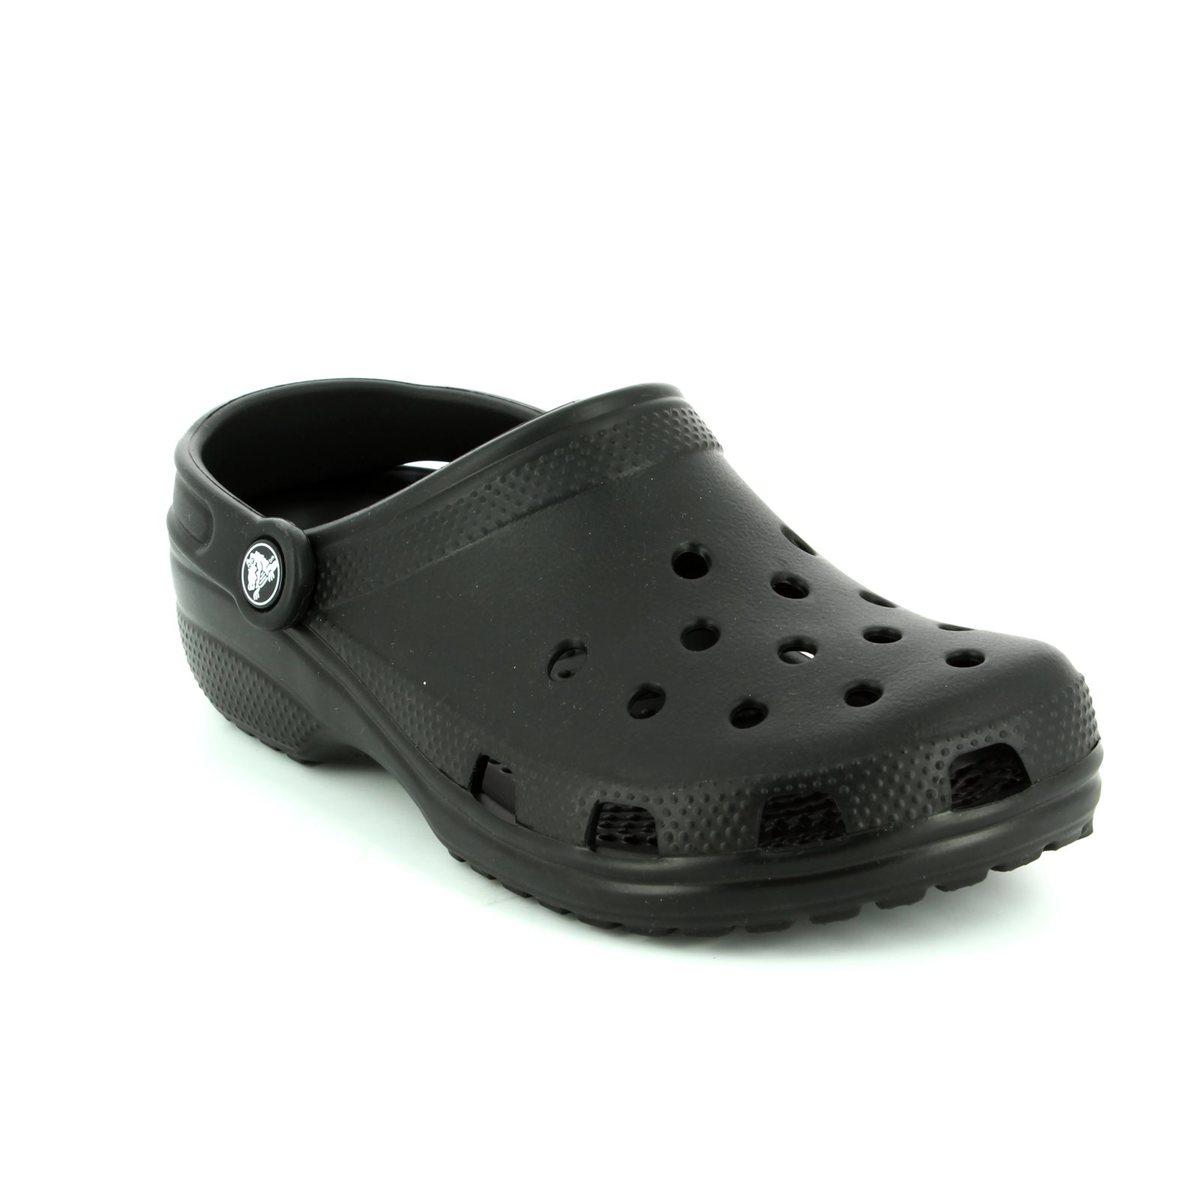 a7b5dcb47bbca Crocs Mens  amp  Womens - Black - 10001 001 CLASSIC